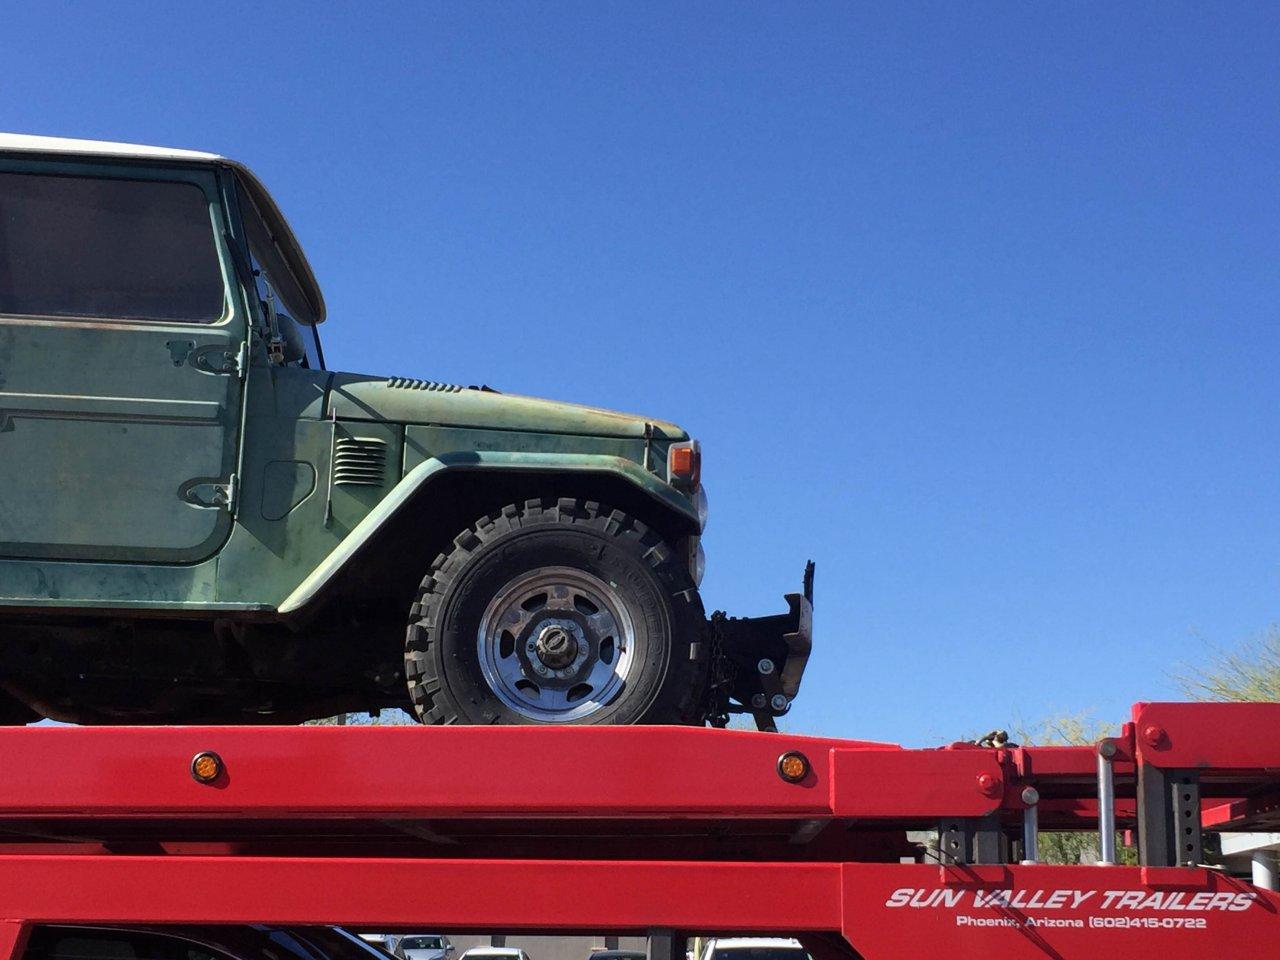 Toyota Lebanon Pa >> Is this 1978 FJ40 front bumper stock?? | IH8MUD Forum